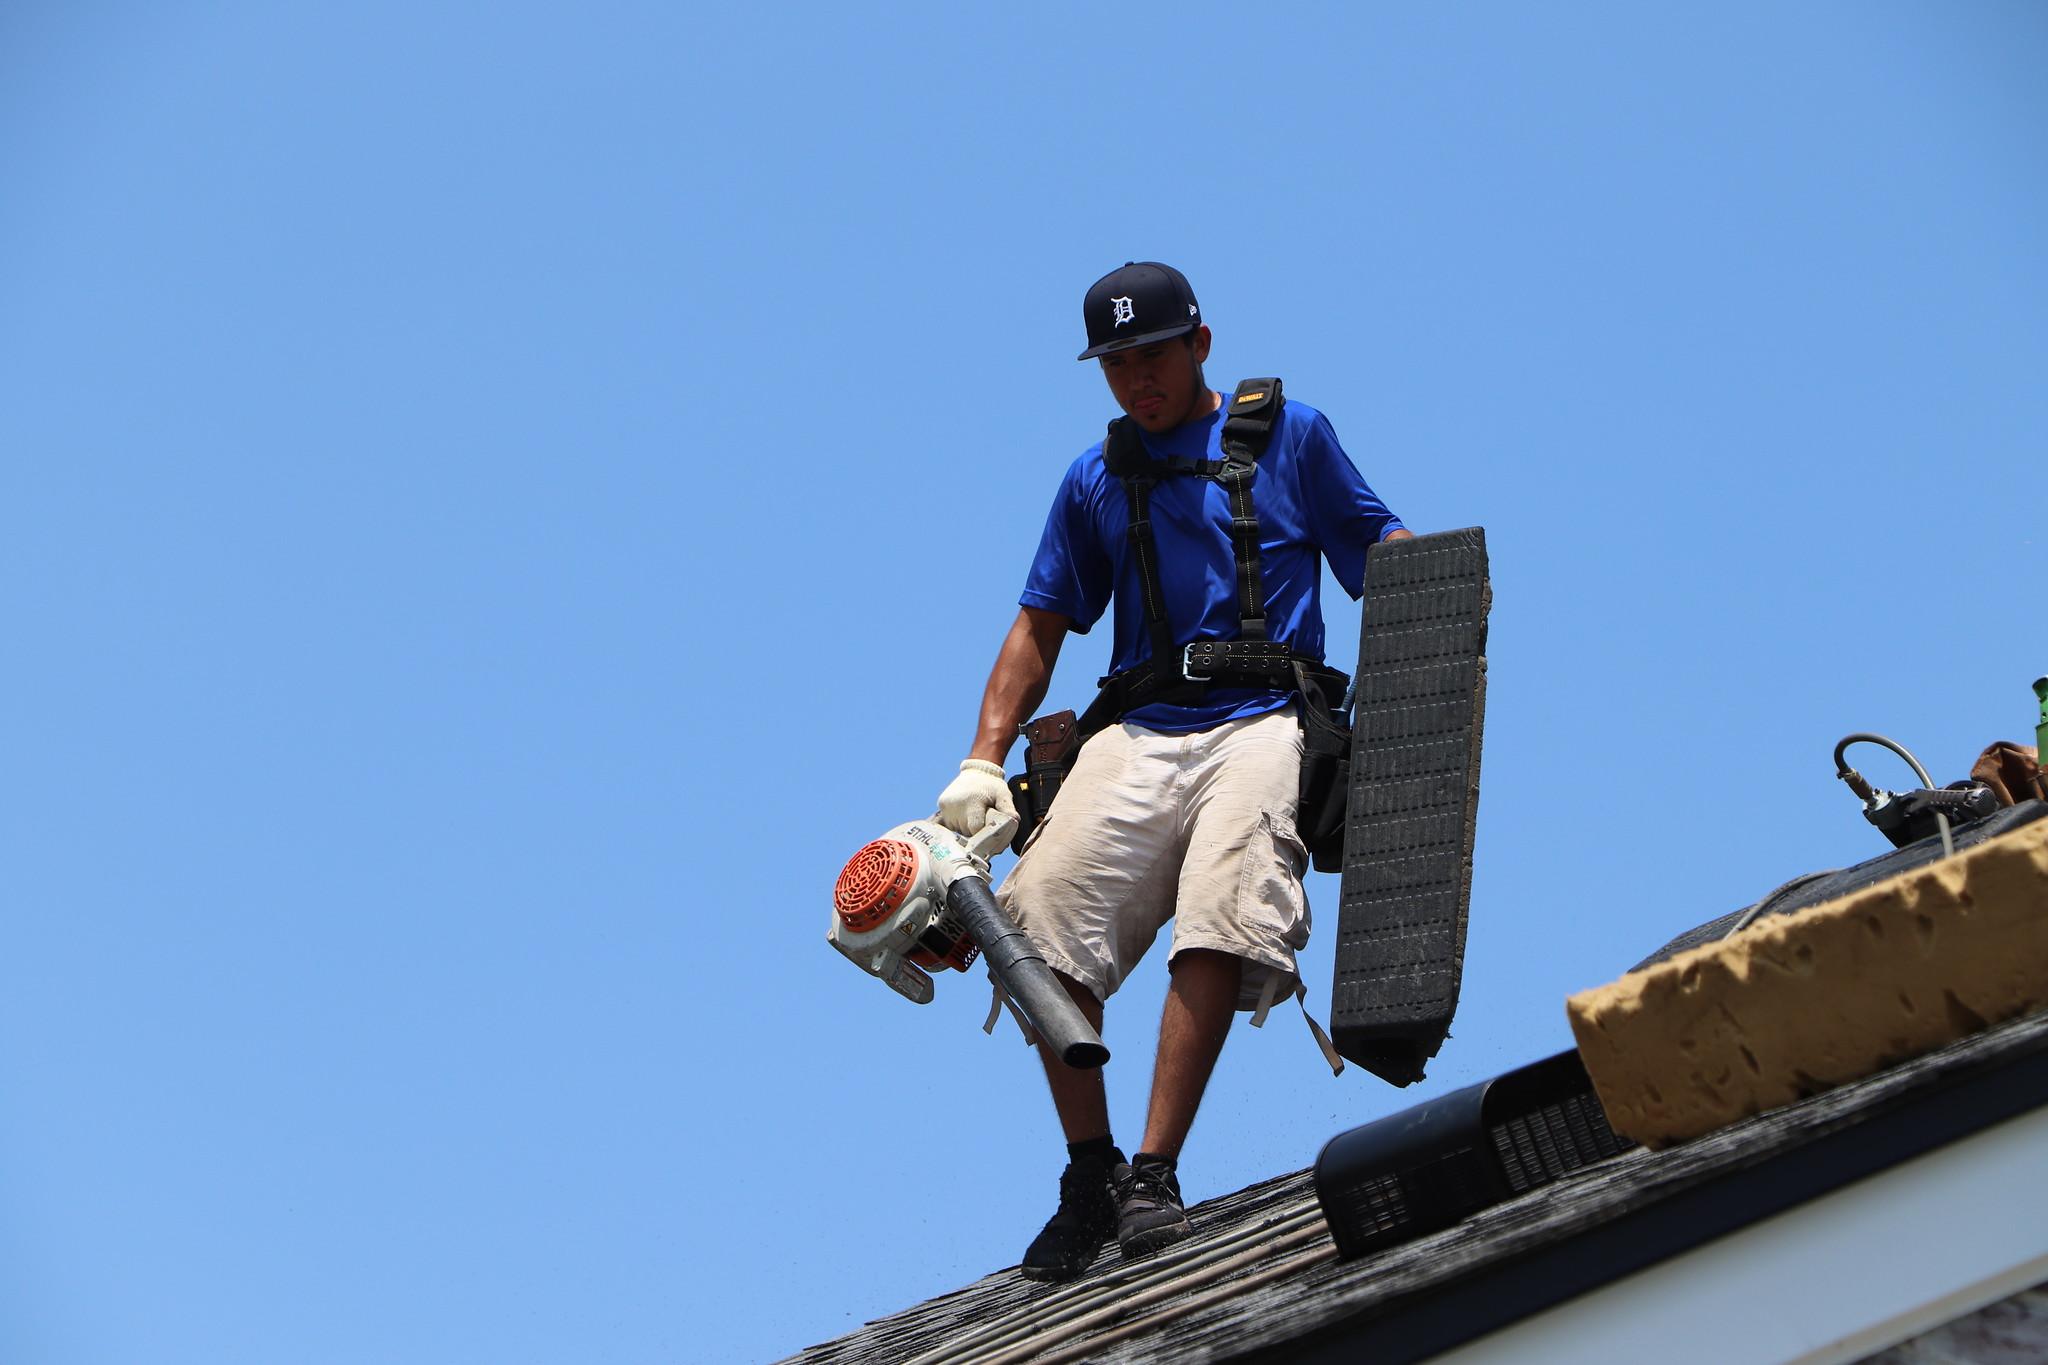 Roofing-contractors-Dearborn-Michigan